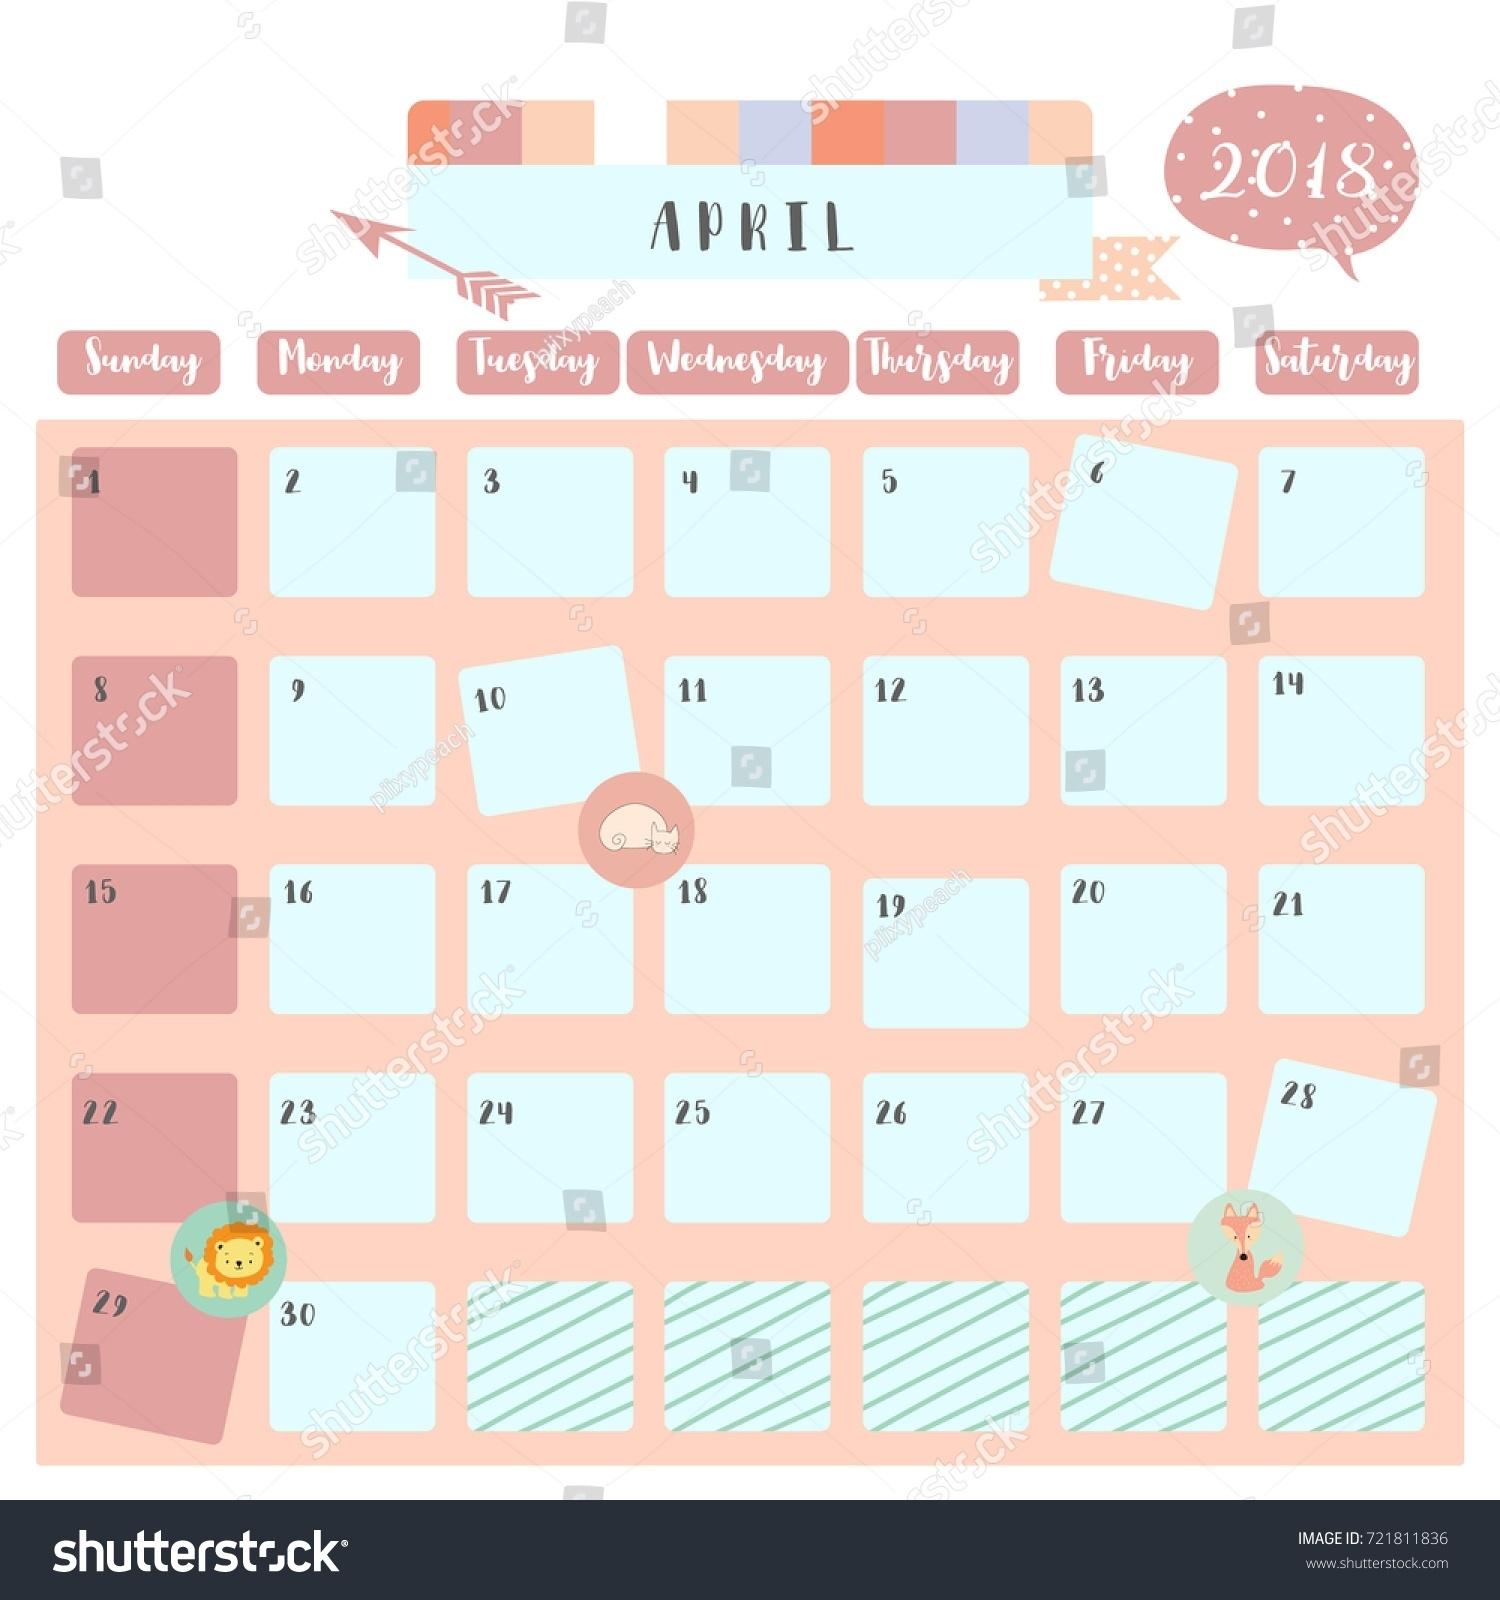 April 2018 Calendar Colorful Flogfolioweekly  Xjb